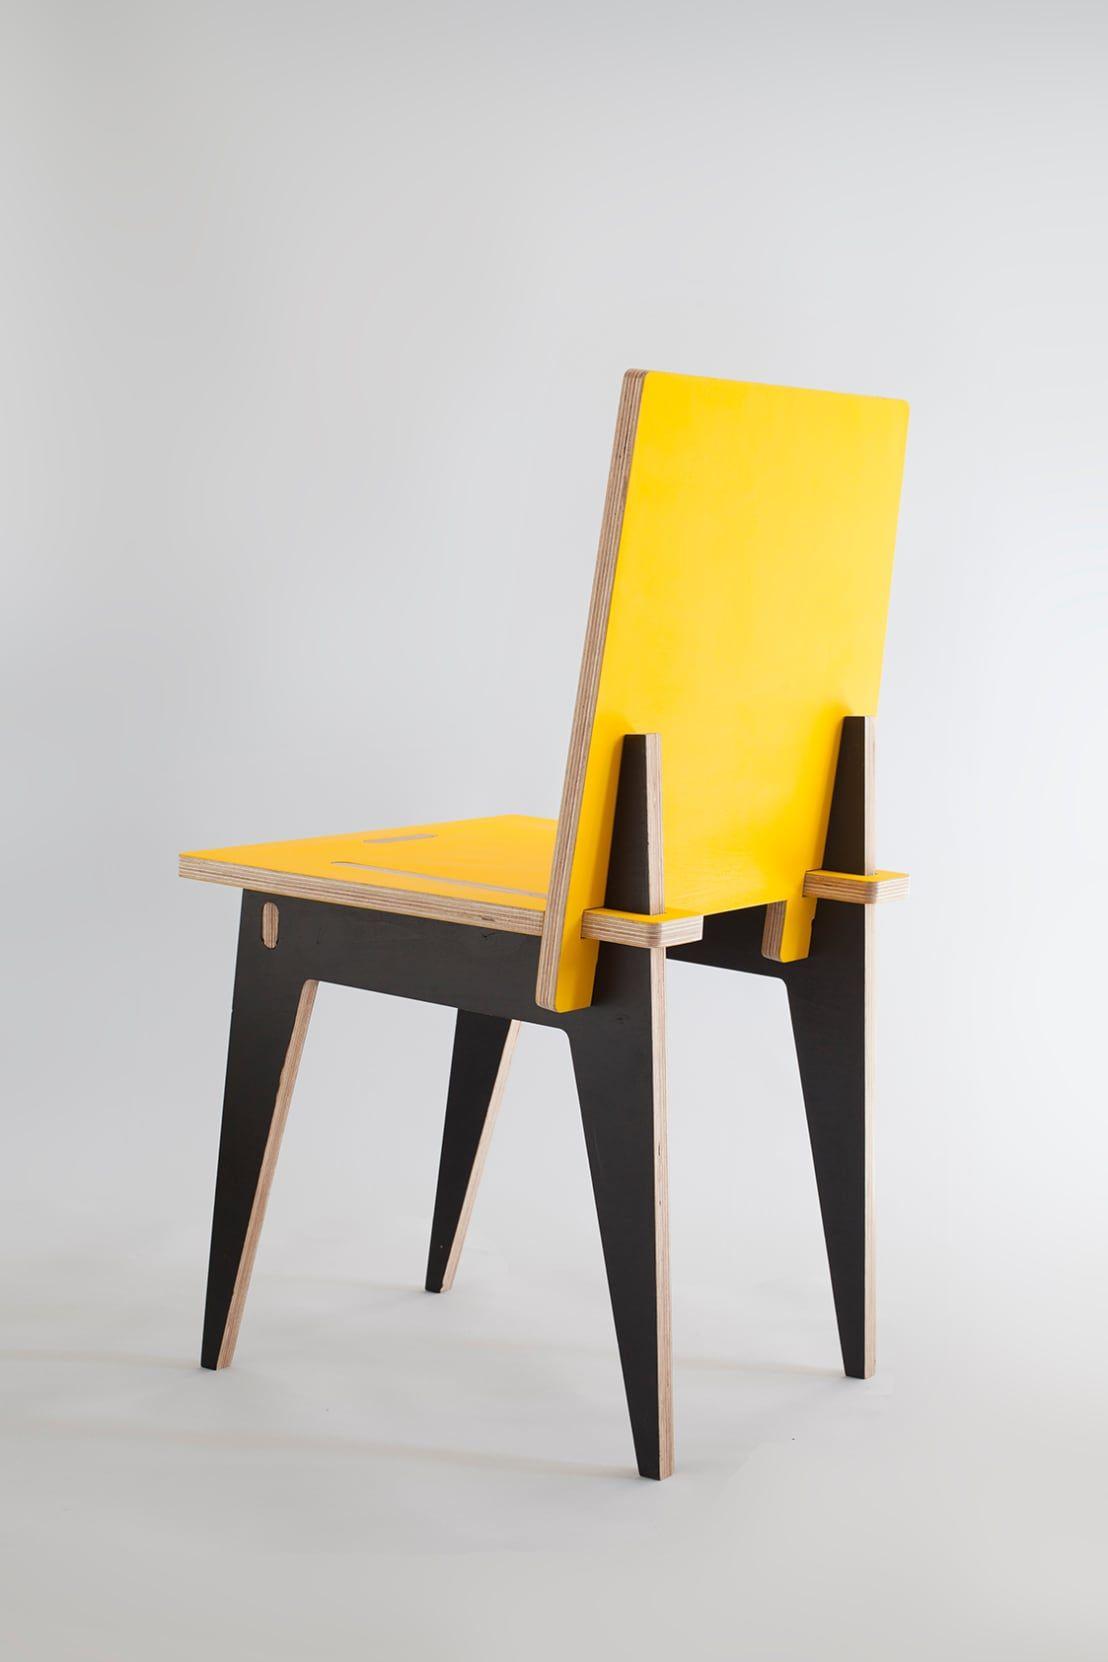 Krzesło klinowe profesjonalista robert pludra industrial design